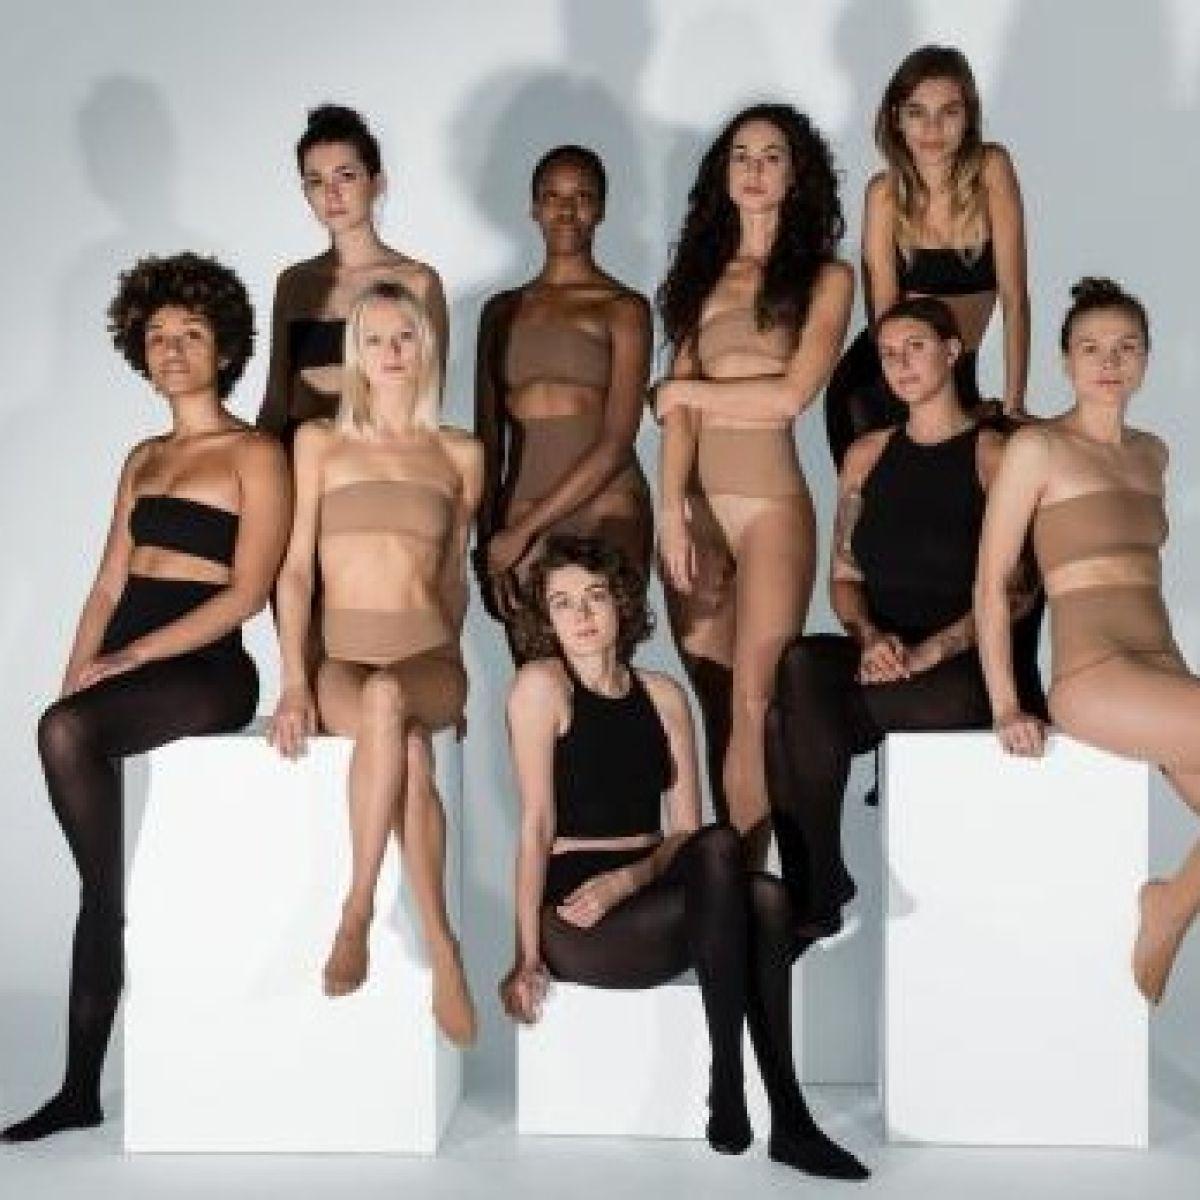 Namibia teen girls topless